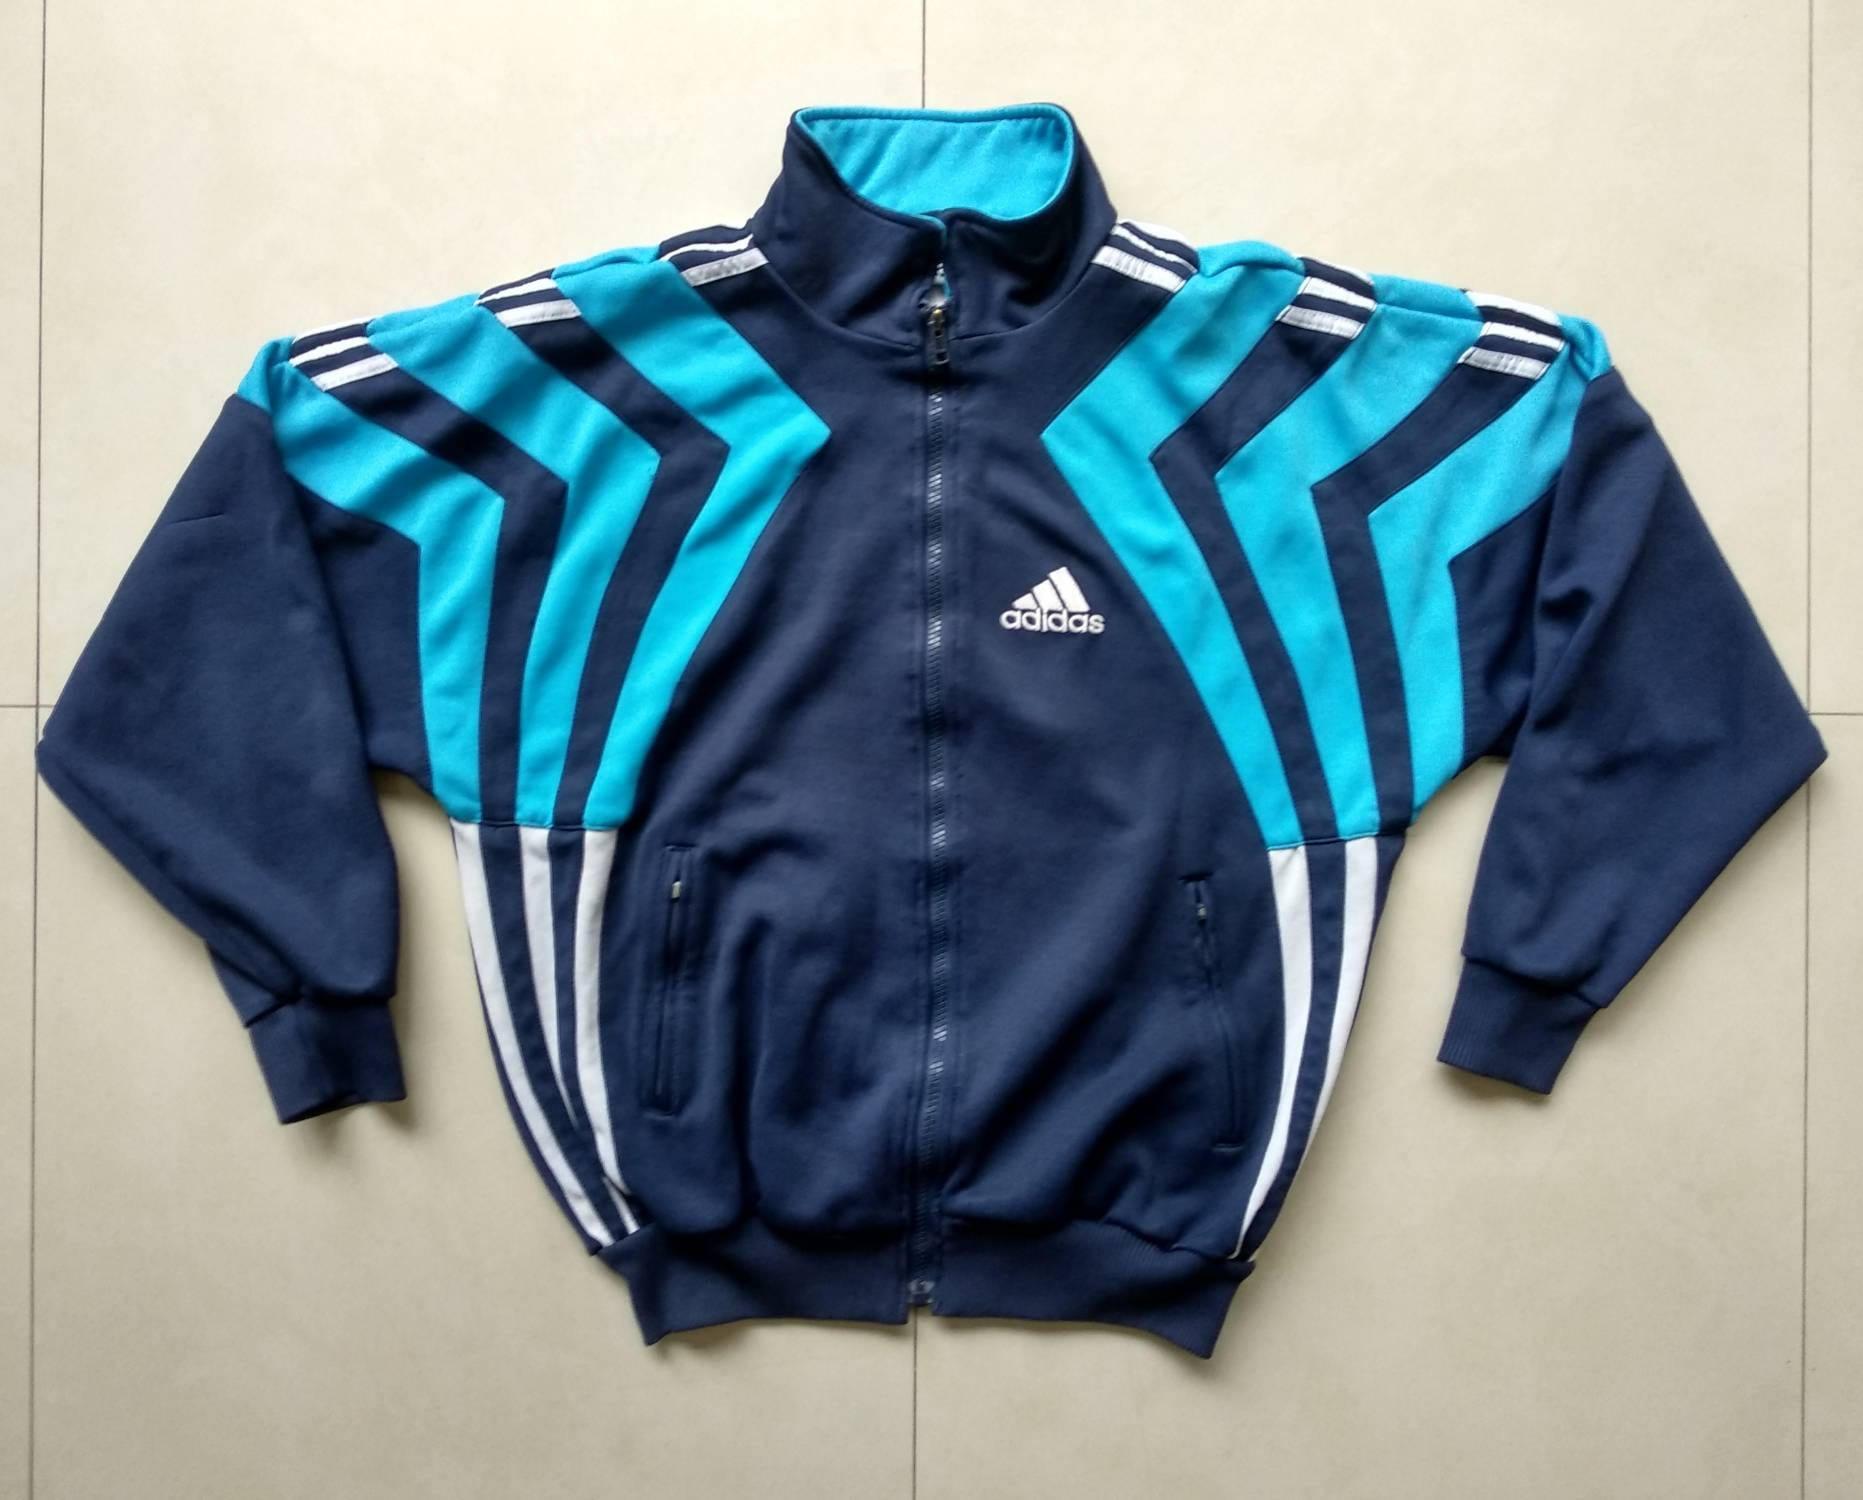 Vtg ADIDAS track windbreaker jacket old school mafia retro 90s 80s nike pink harts jogging fila puma outdoor bomber sweatshirt Size S